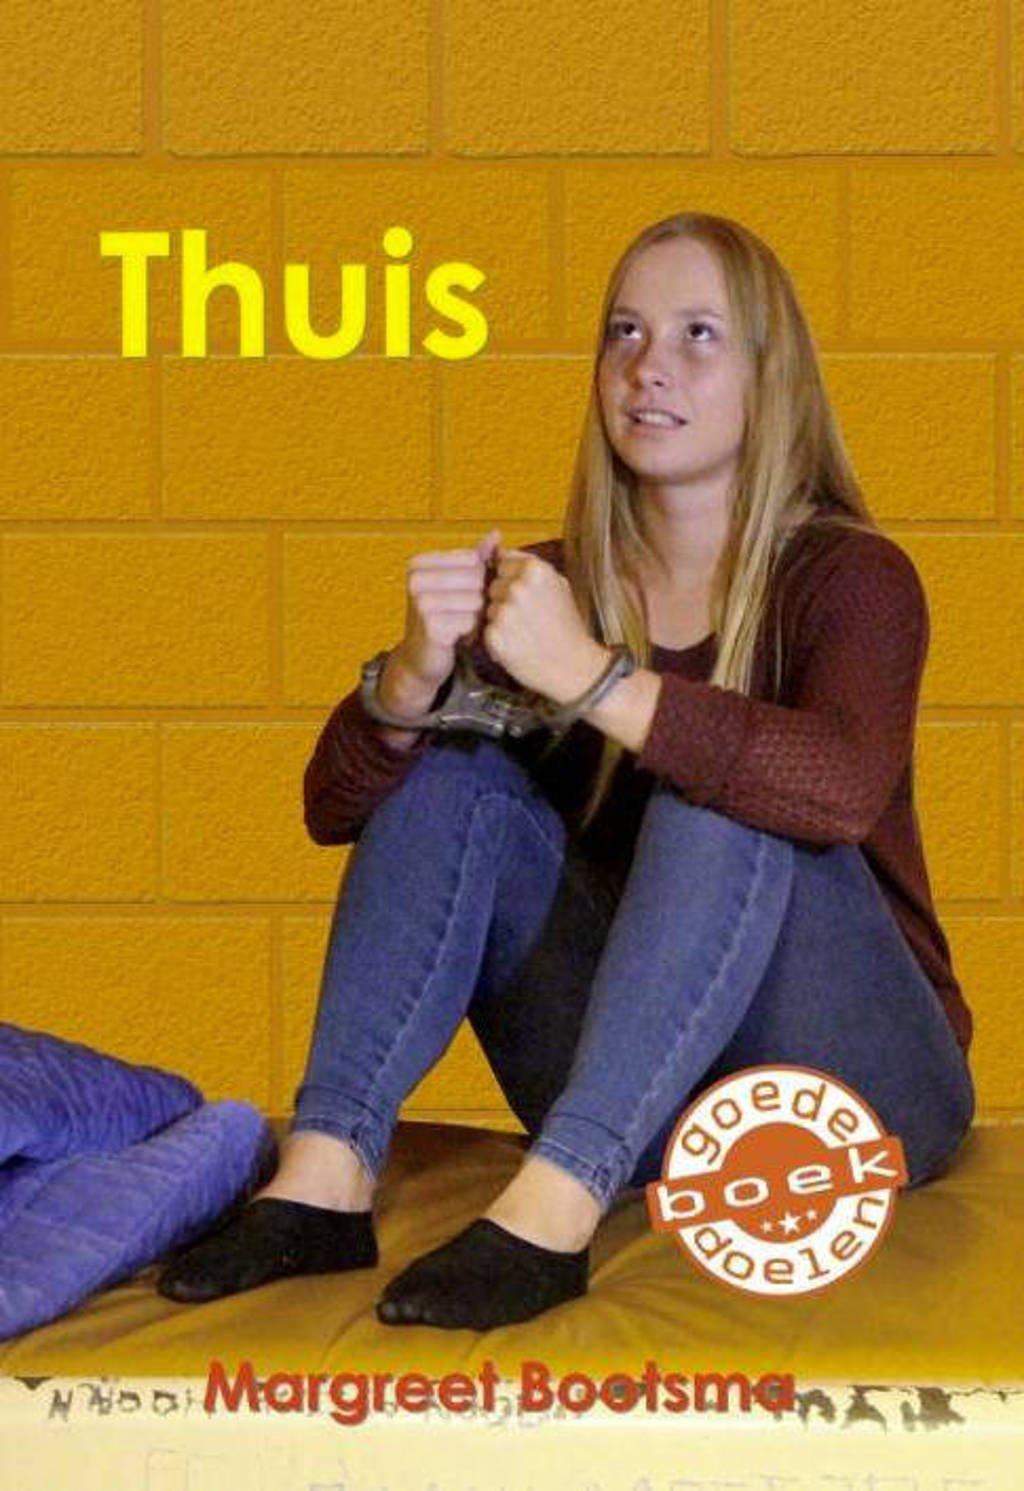 Thuis - Margreet Bootsma-Oud